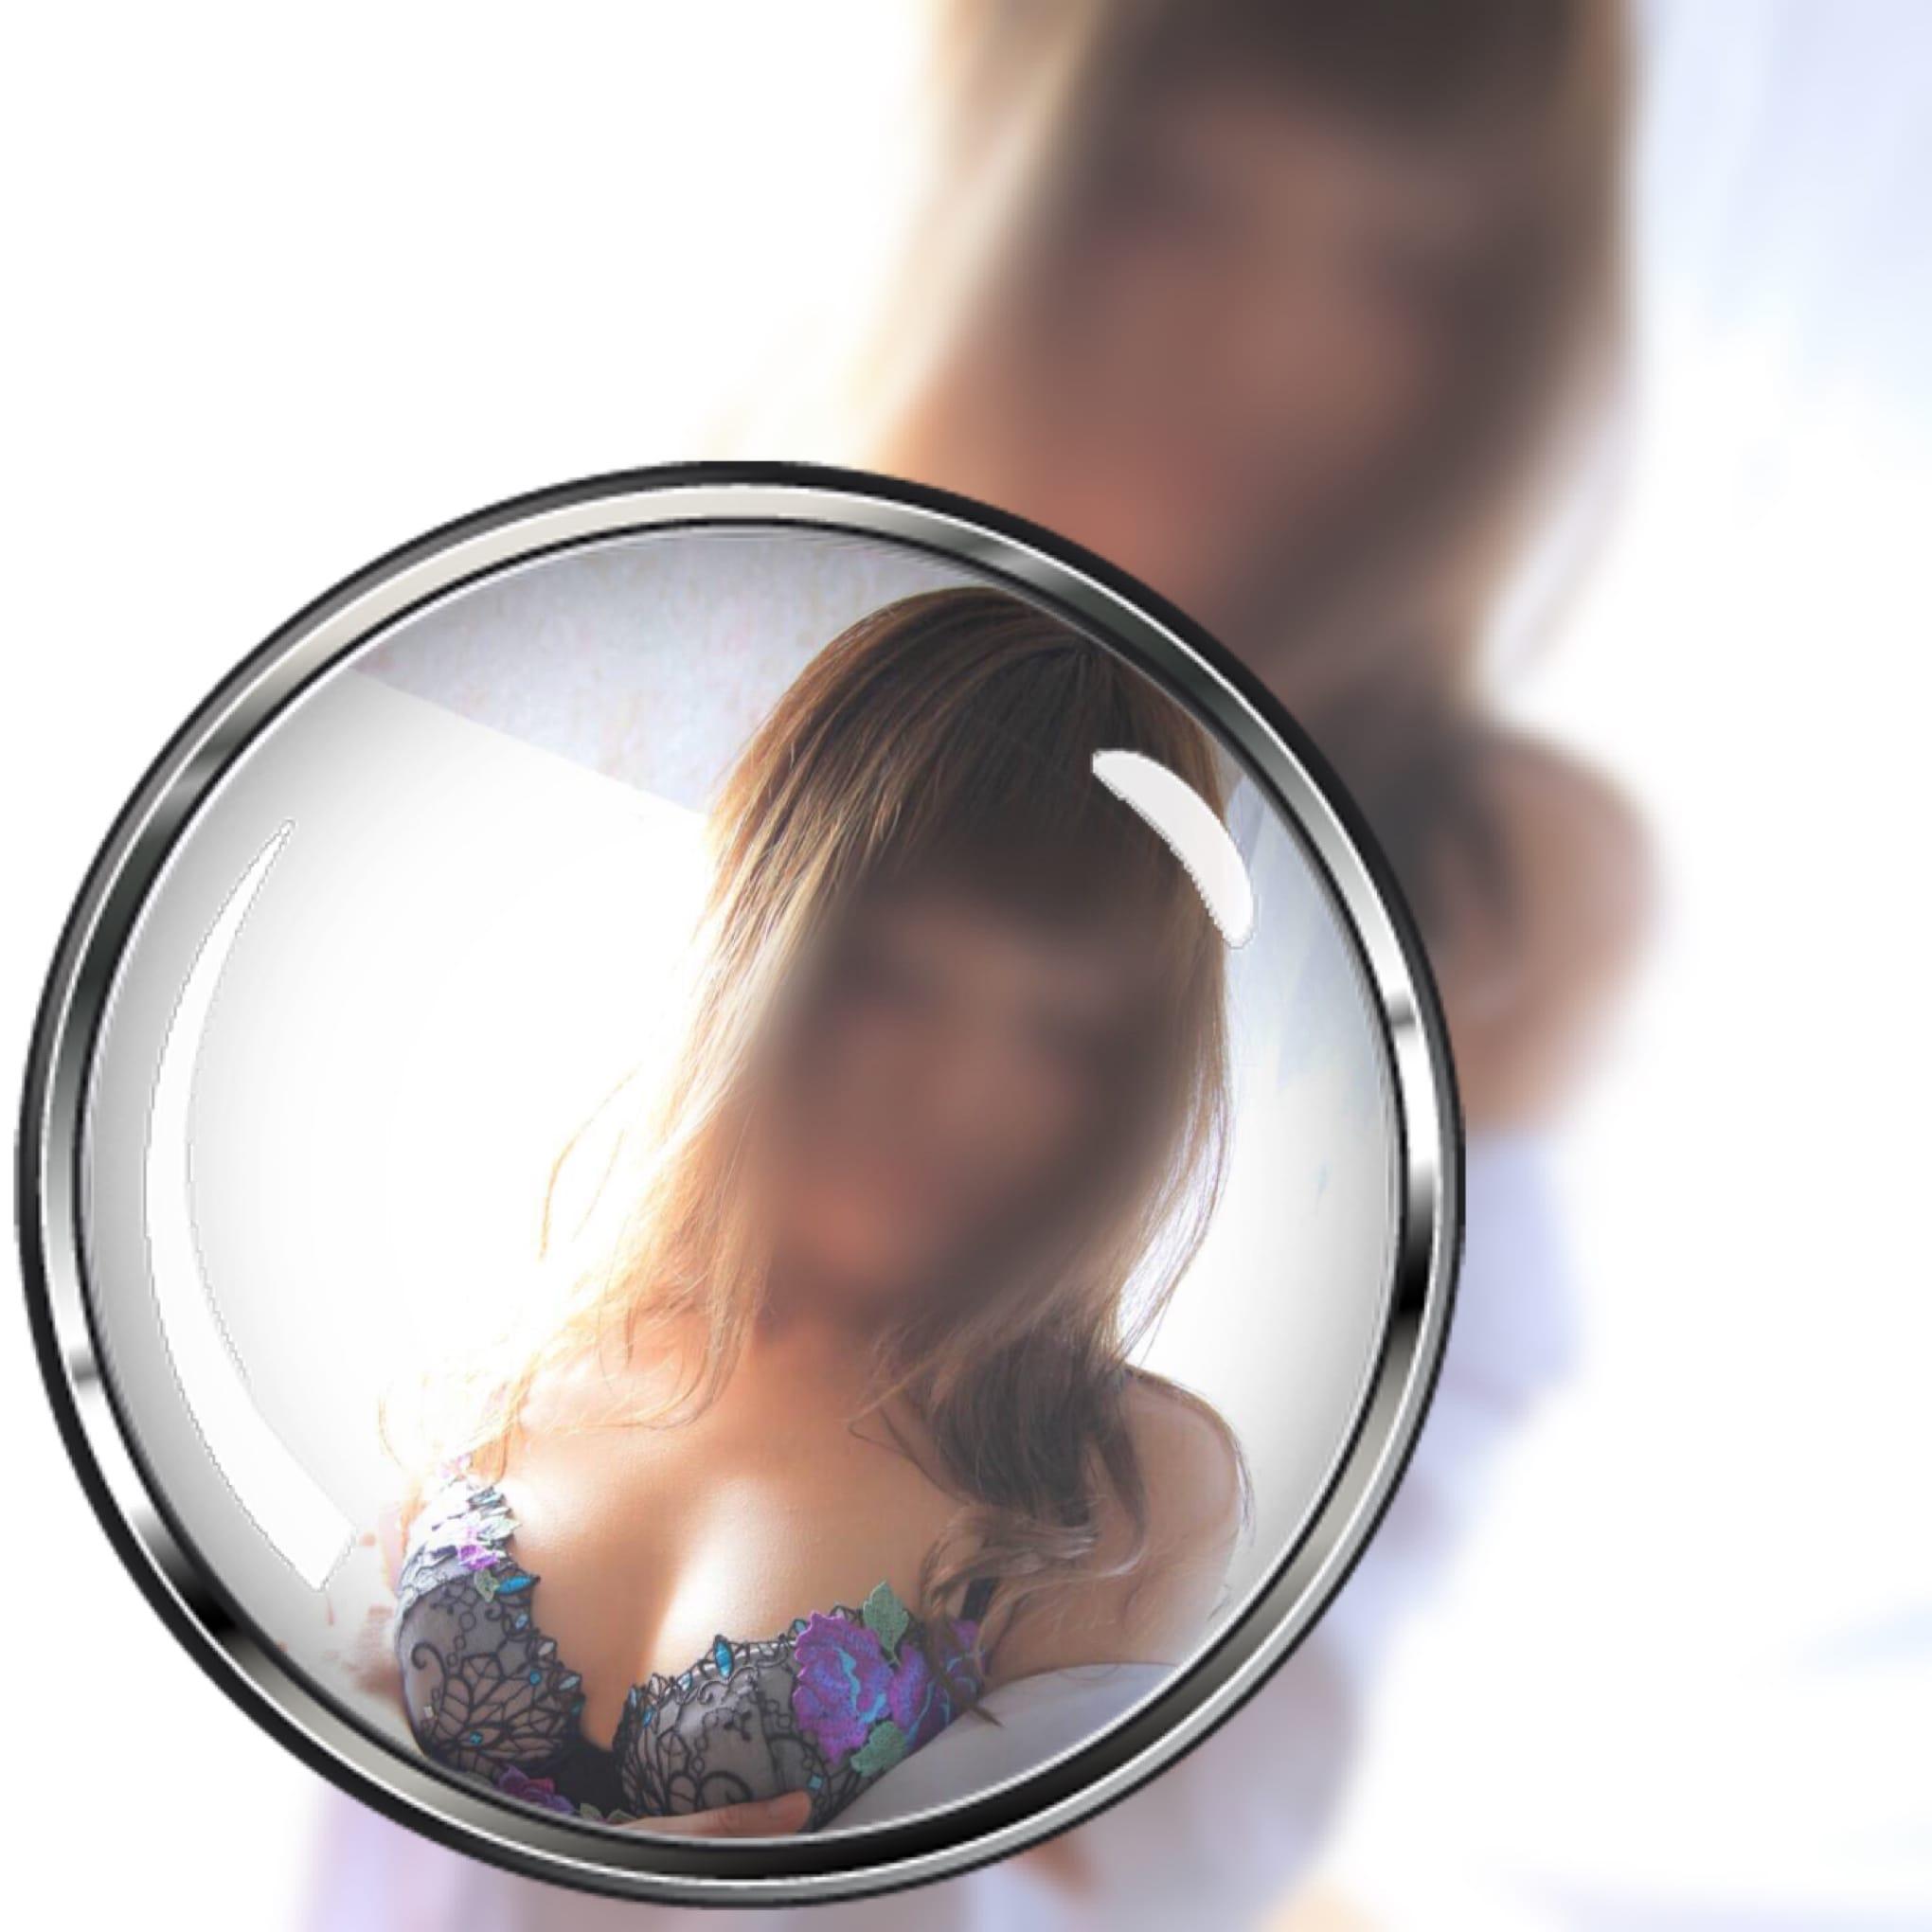 「昨夜★」03/18(03/18) 20:02   美咲の写メ・風俗動画